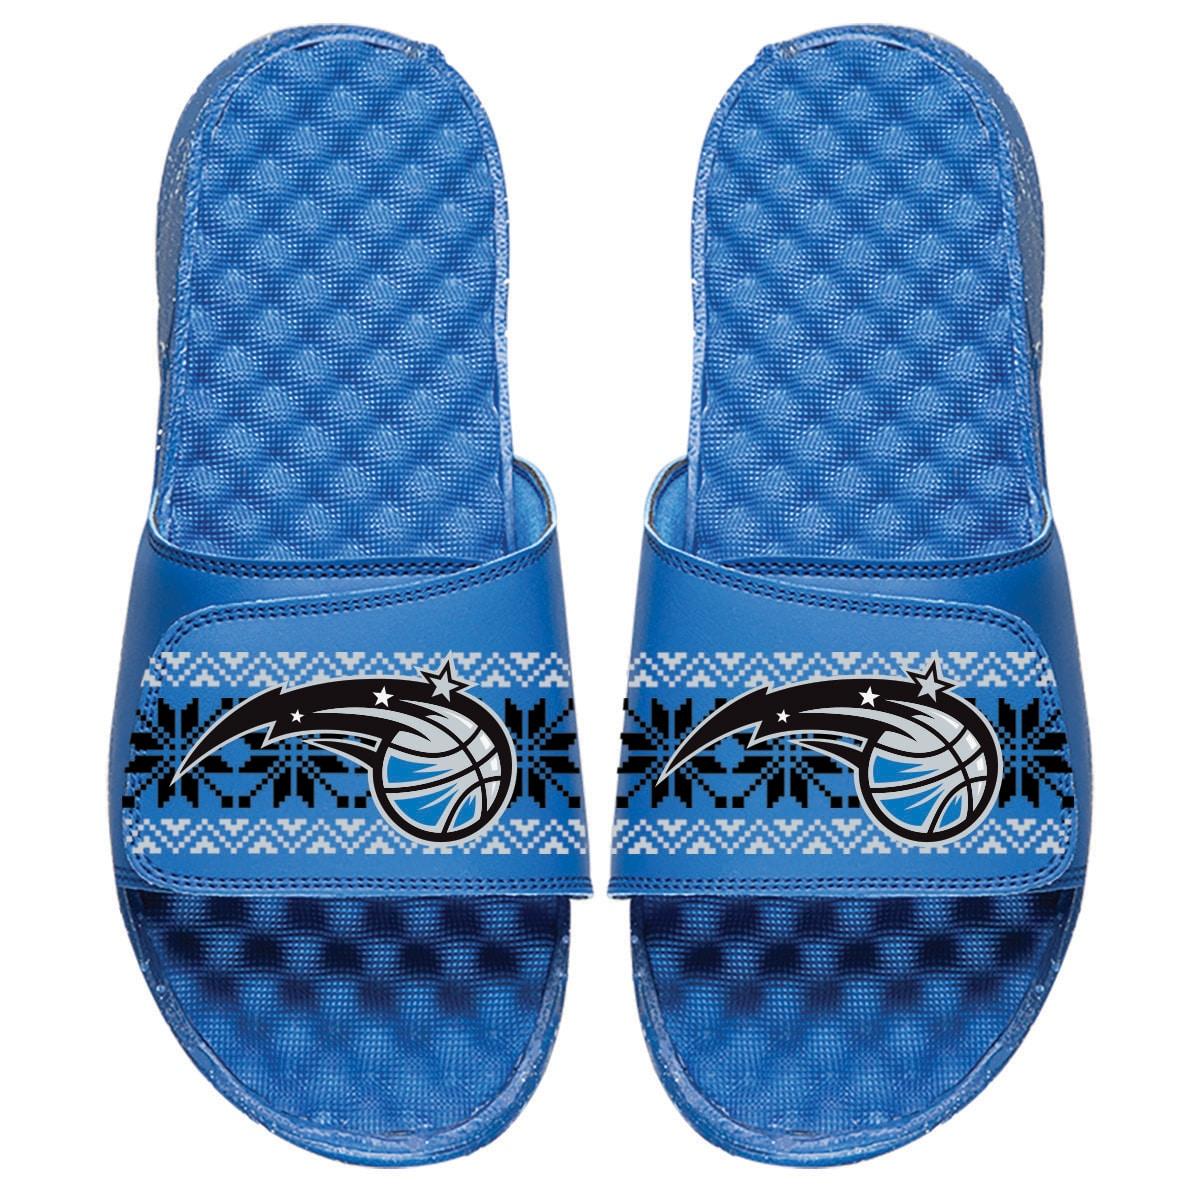 Orlando Magic ISlide Ugly Sweater Slide Sandals - Royal